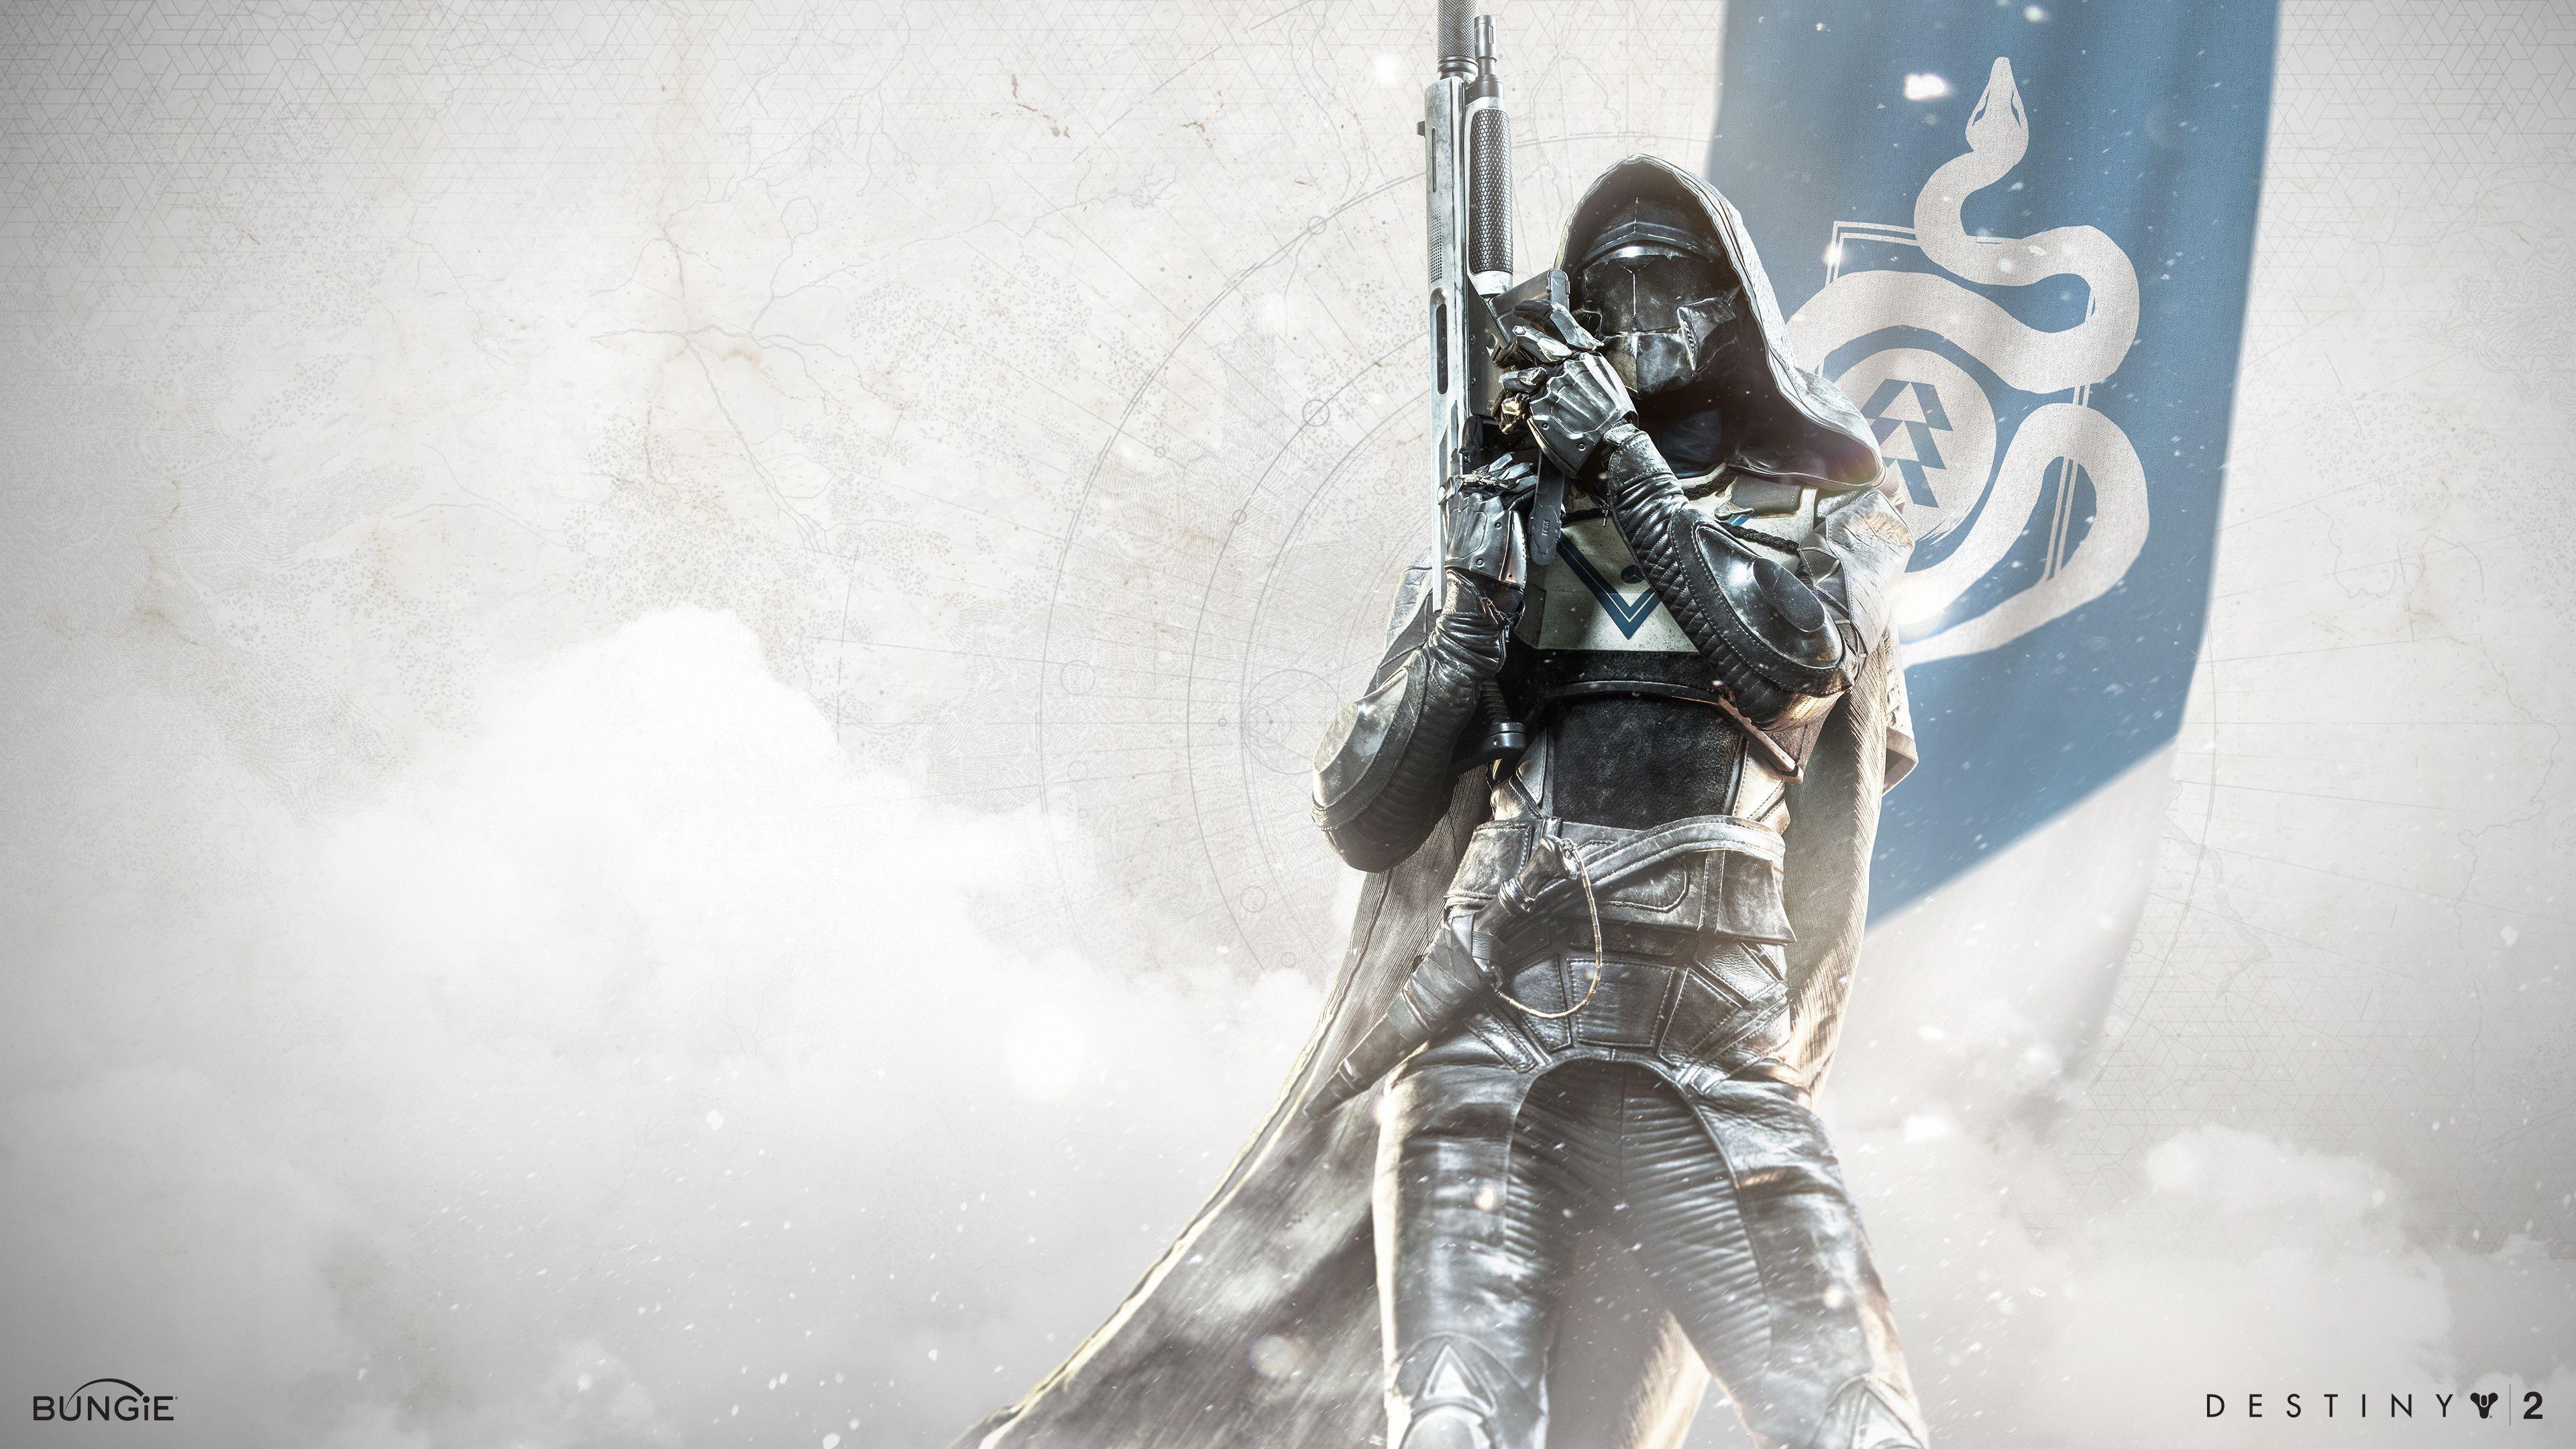 Destiny 2 Hunter Wallpapers Top Free Destiny 2 Hunter Backgrounds Wallpaperaccess